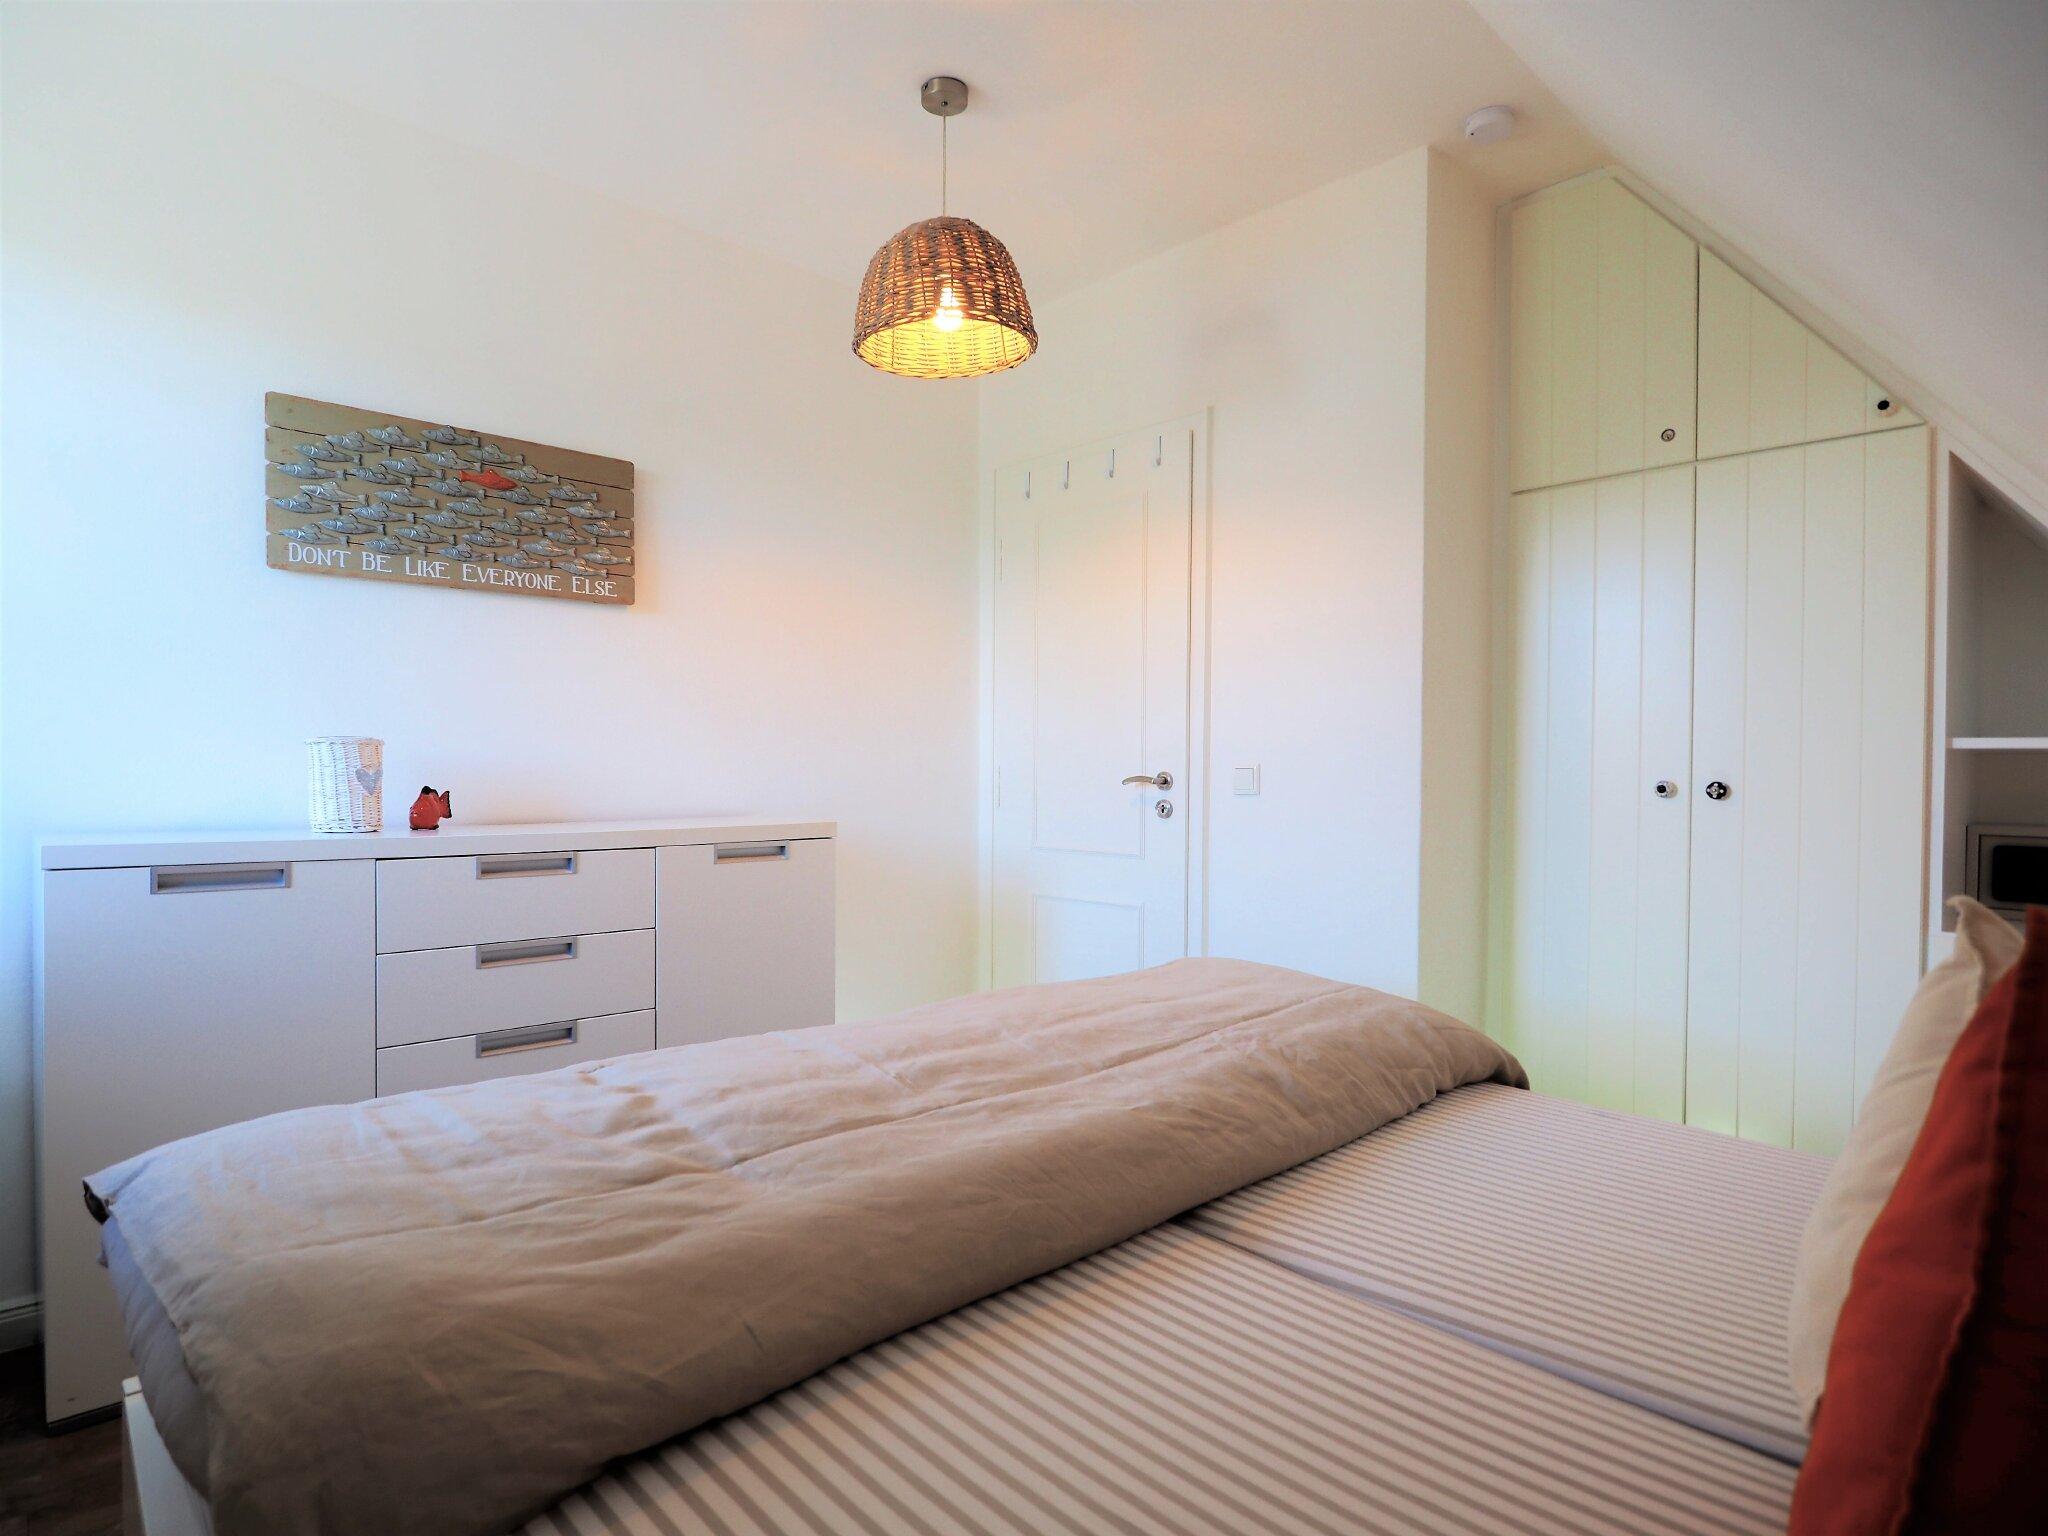 Doppelbett 180x200, Schrank, Kommode